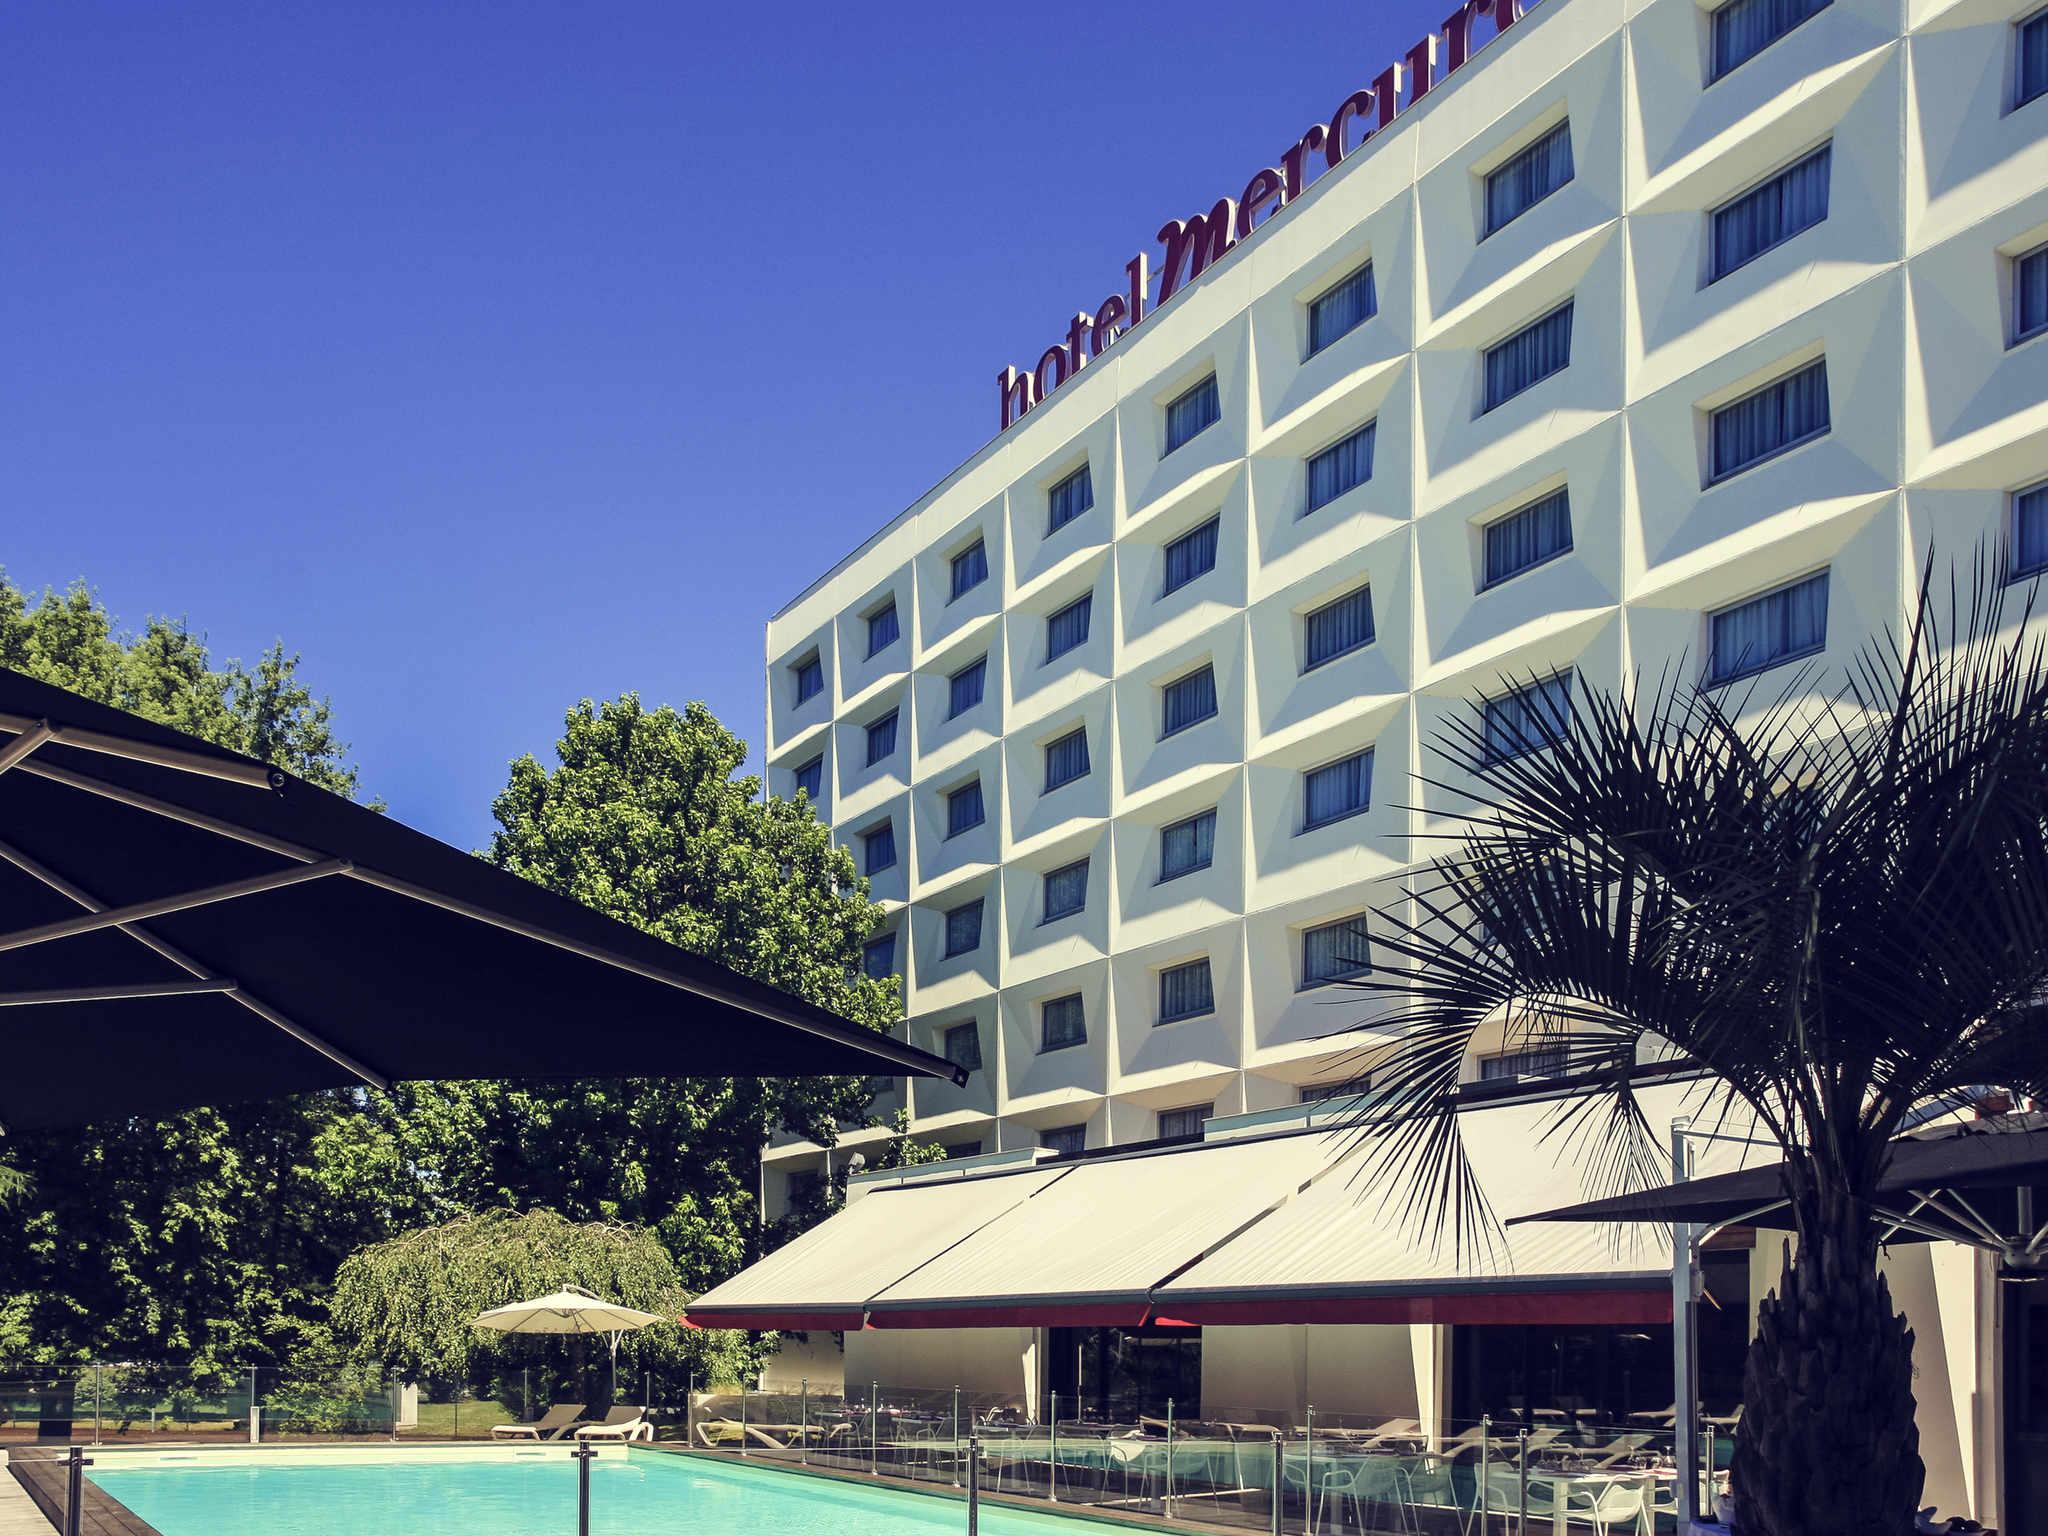 Hotel – Albergo Mercure Bordeaux Lac